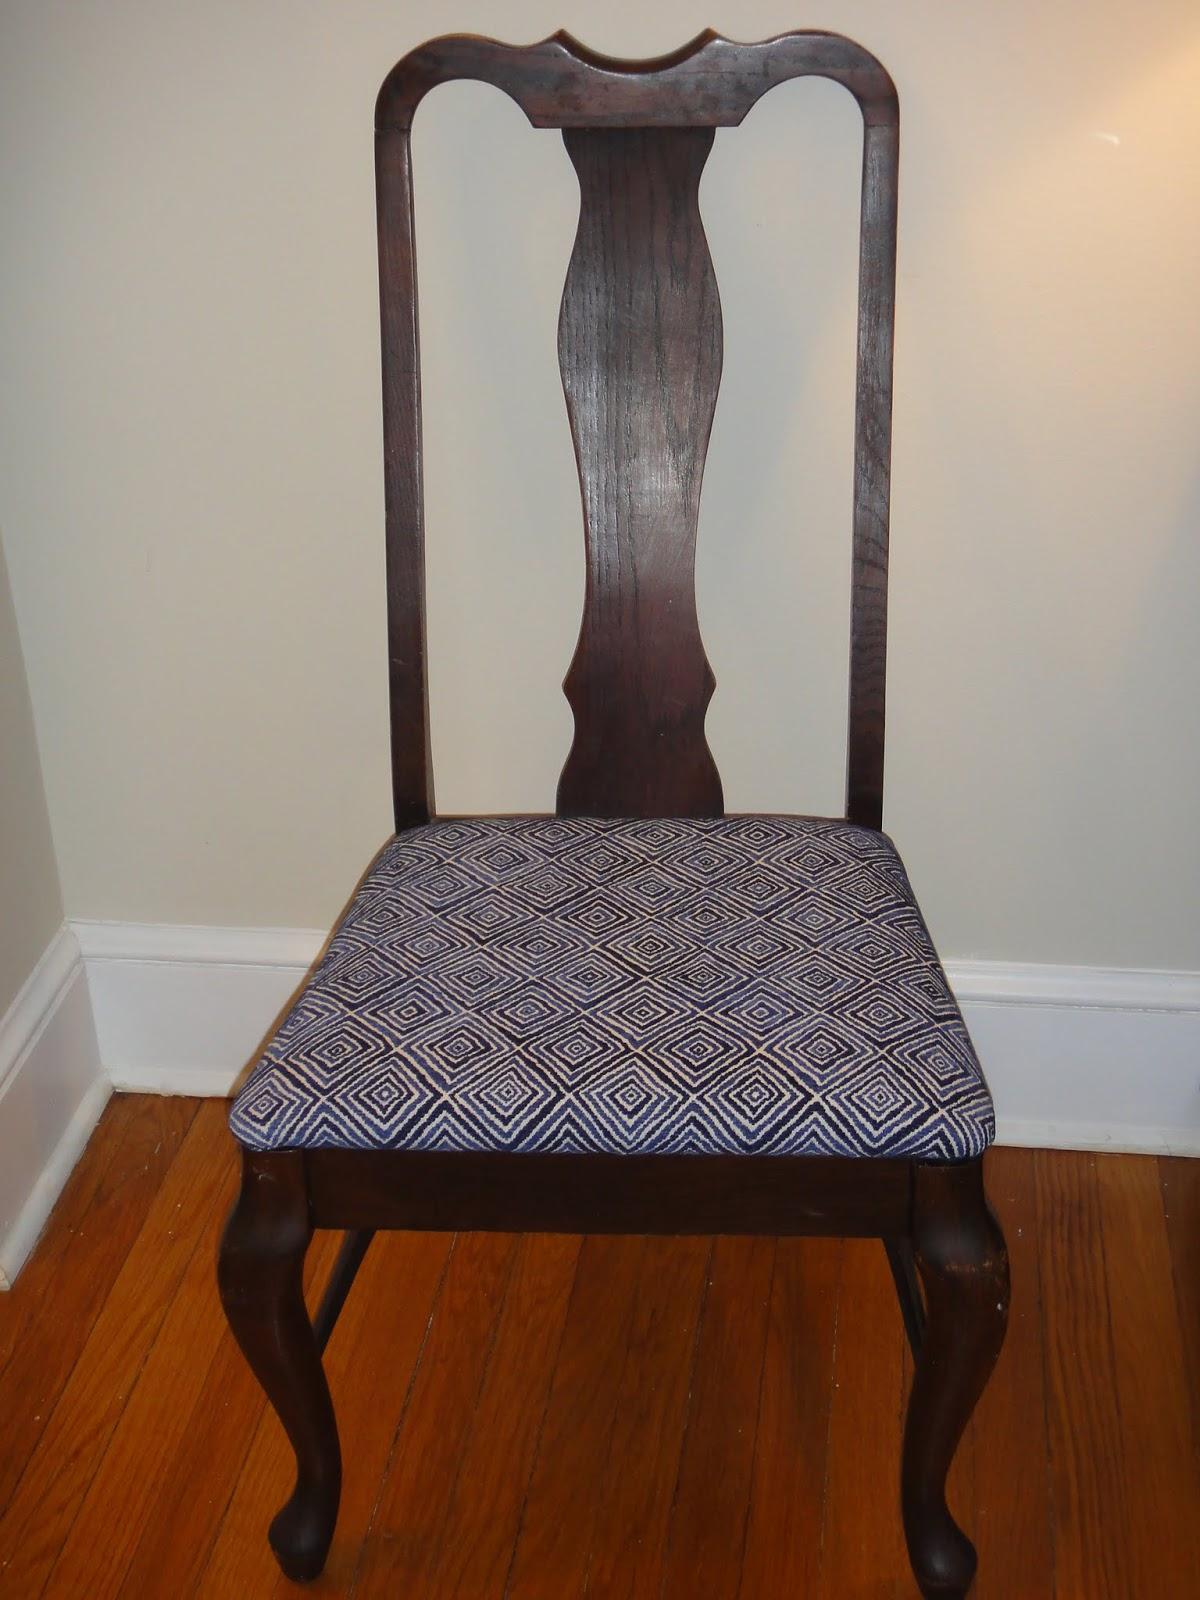 Craigslist Furniture In Arlington TX